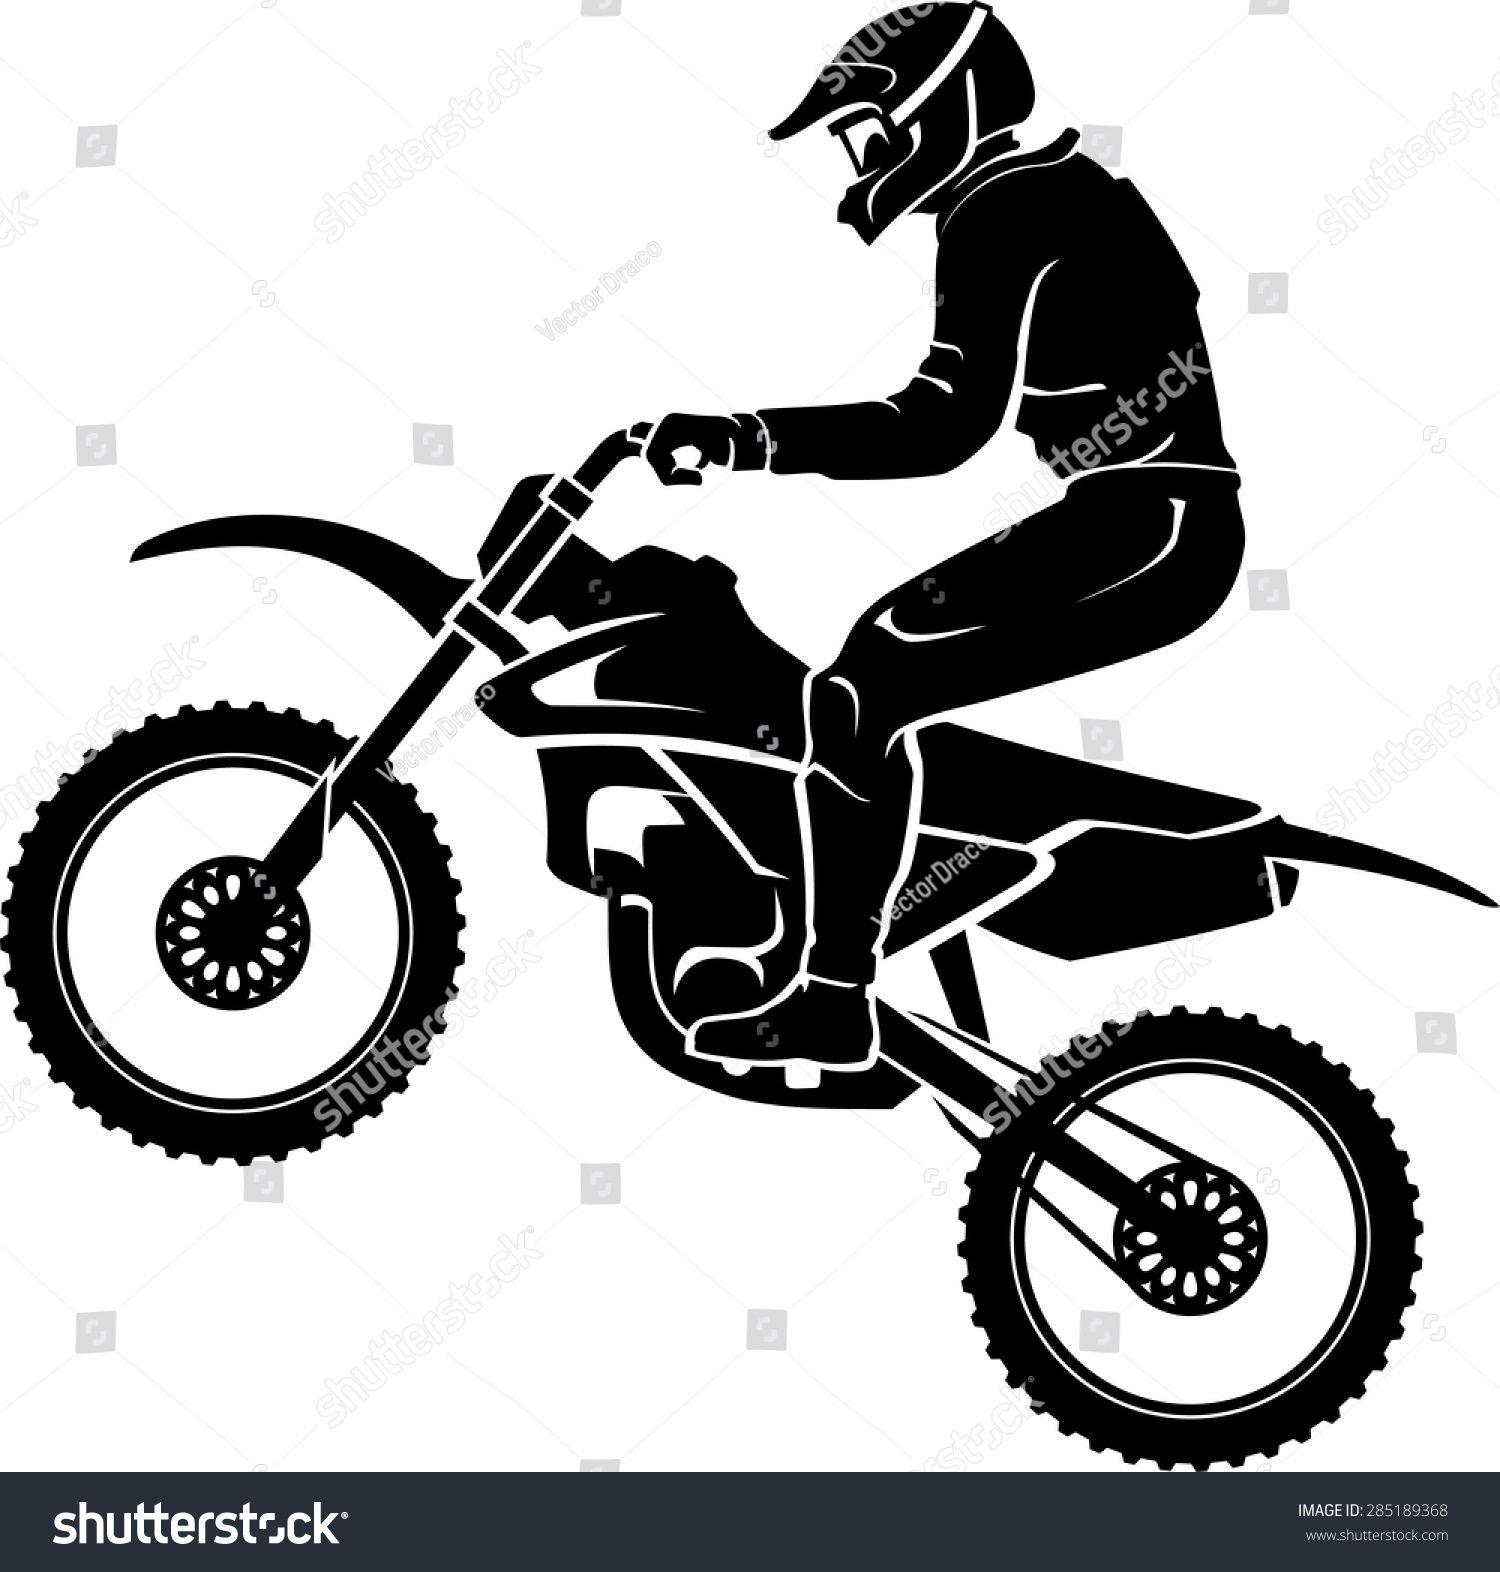 Motocross Rider Silhouette Motocross Riders Bike Silhouette